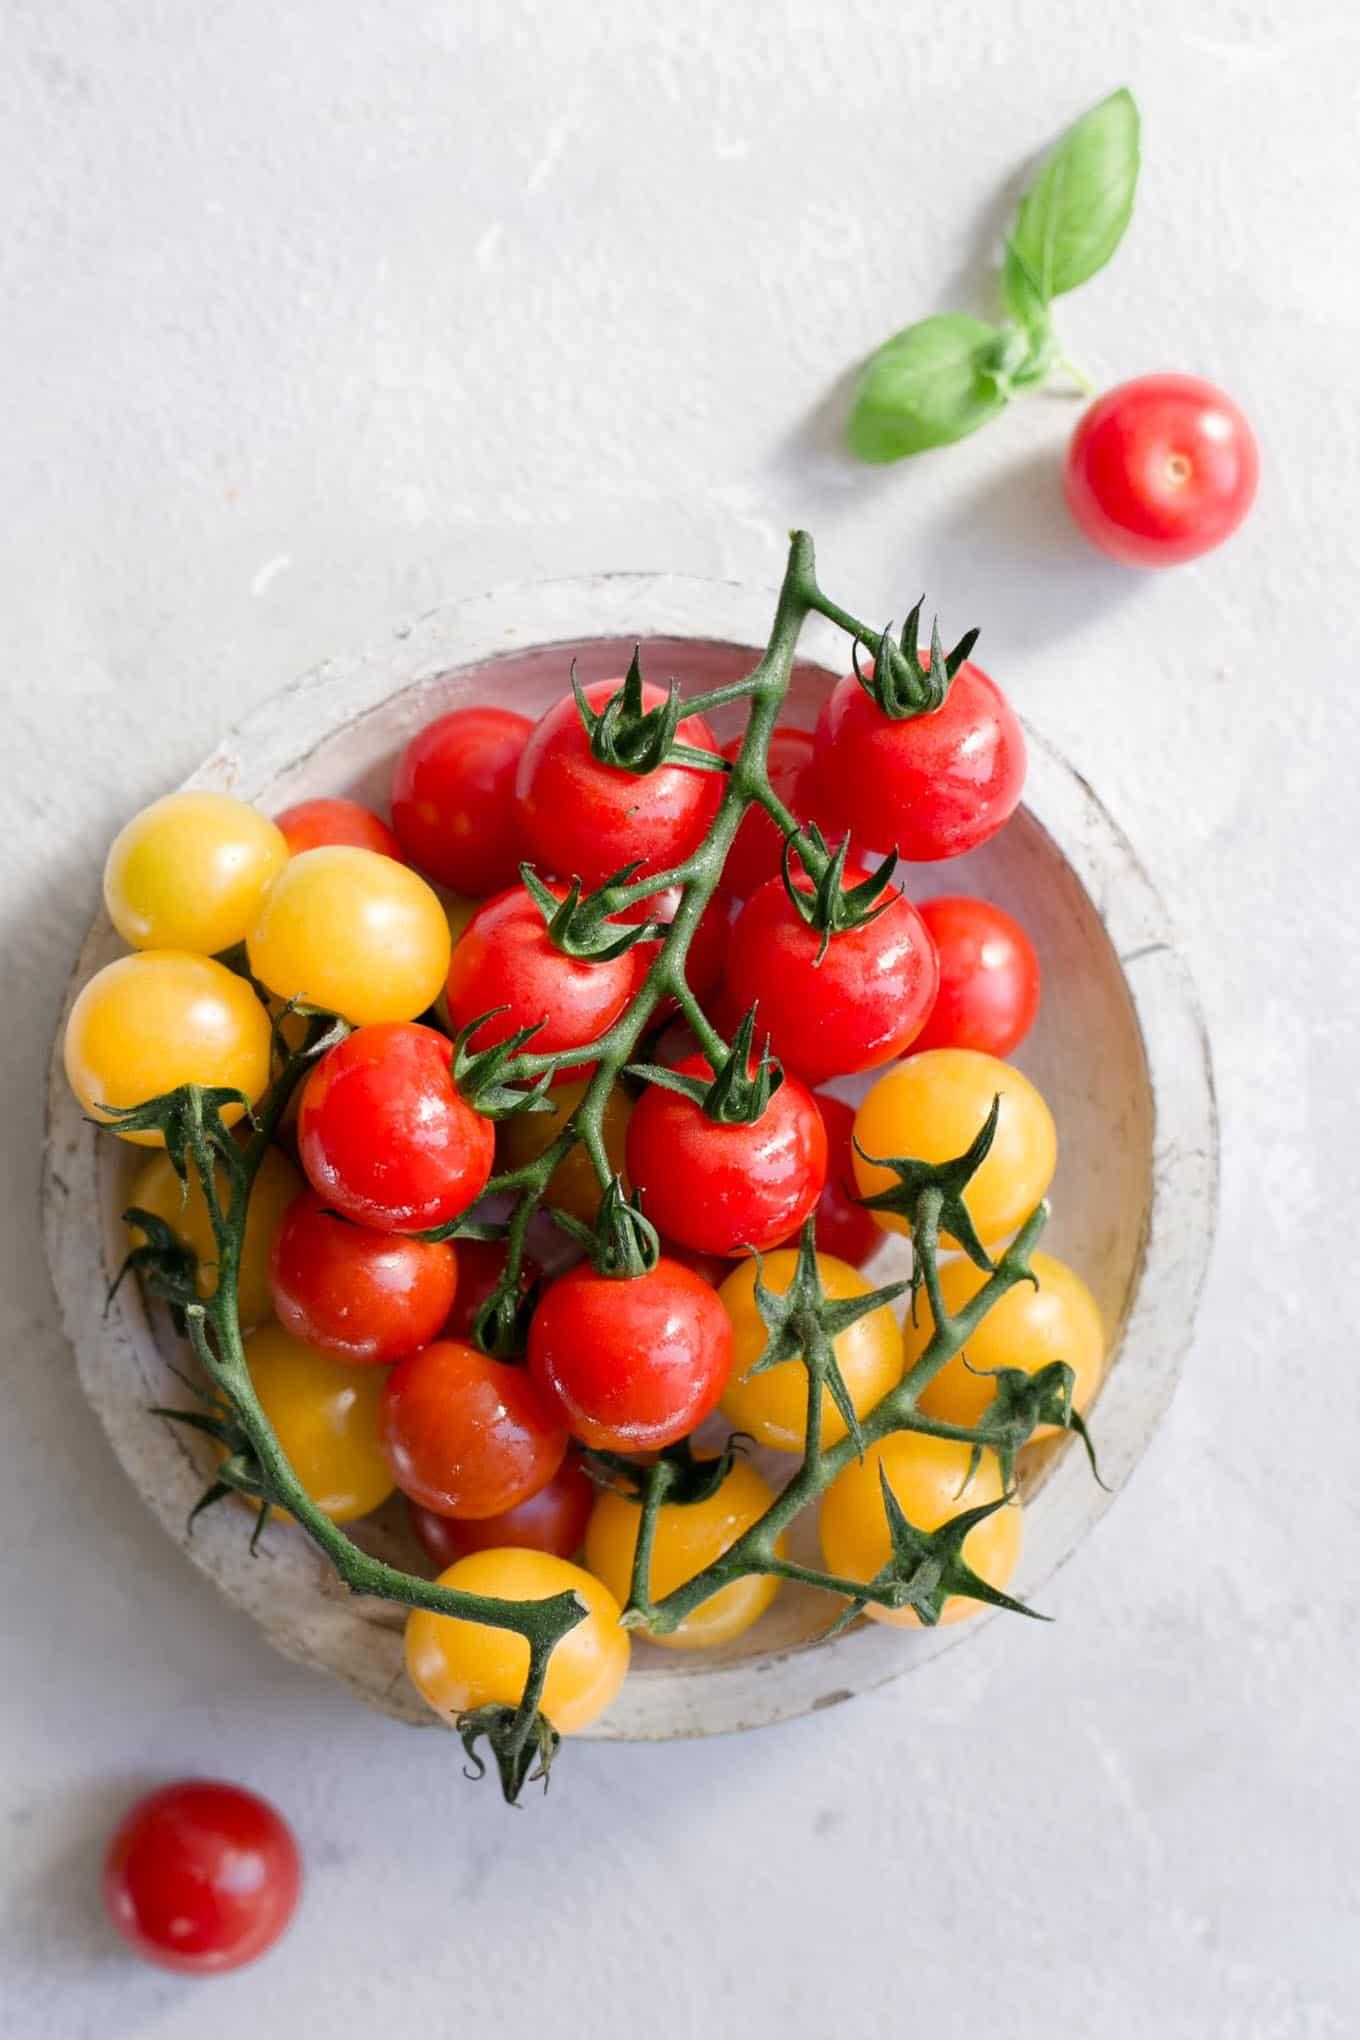 Super quick and easy pesto pasta with cherry tomatoes #vegan #healthyrecipe #veganfood | via @annabanana.co